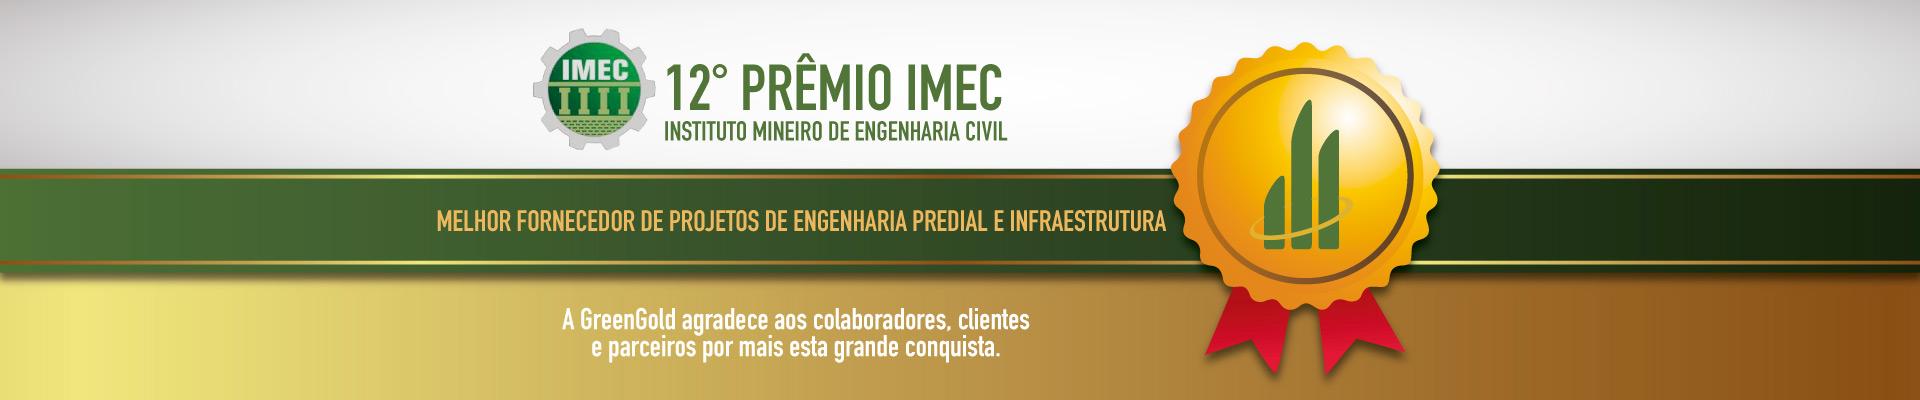 BANNER-PREMIO-IMEC1